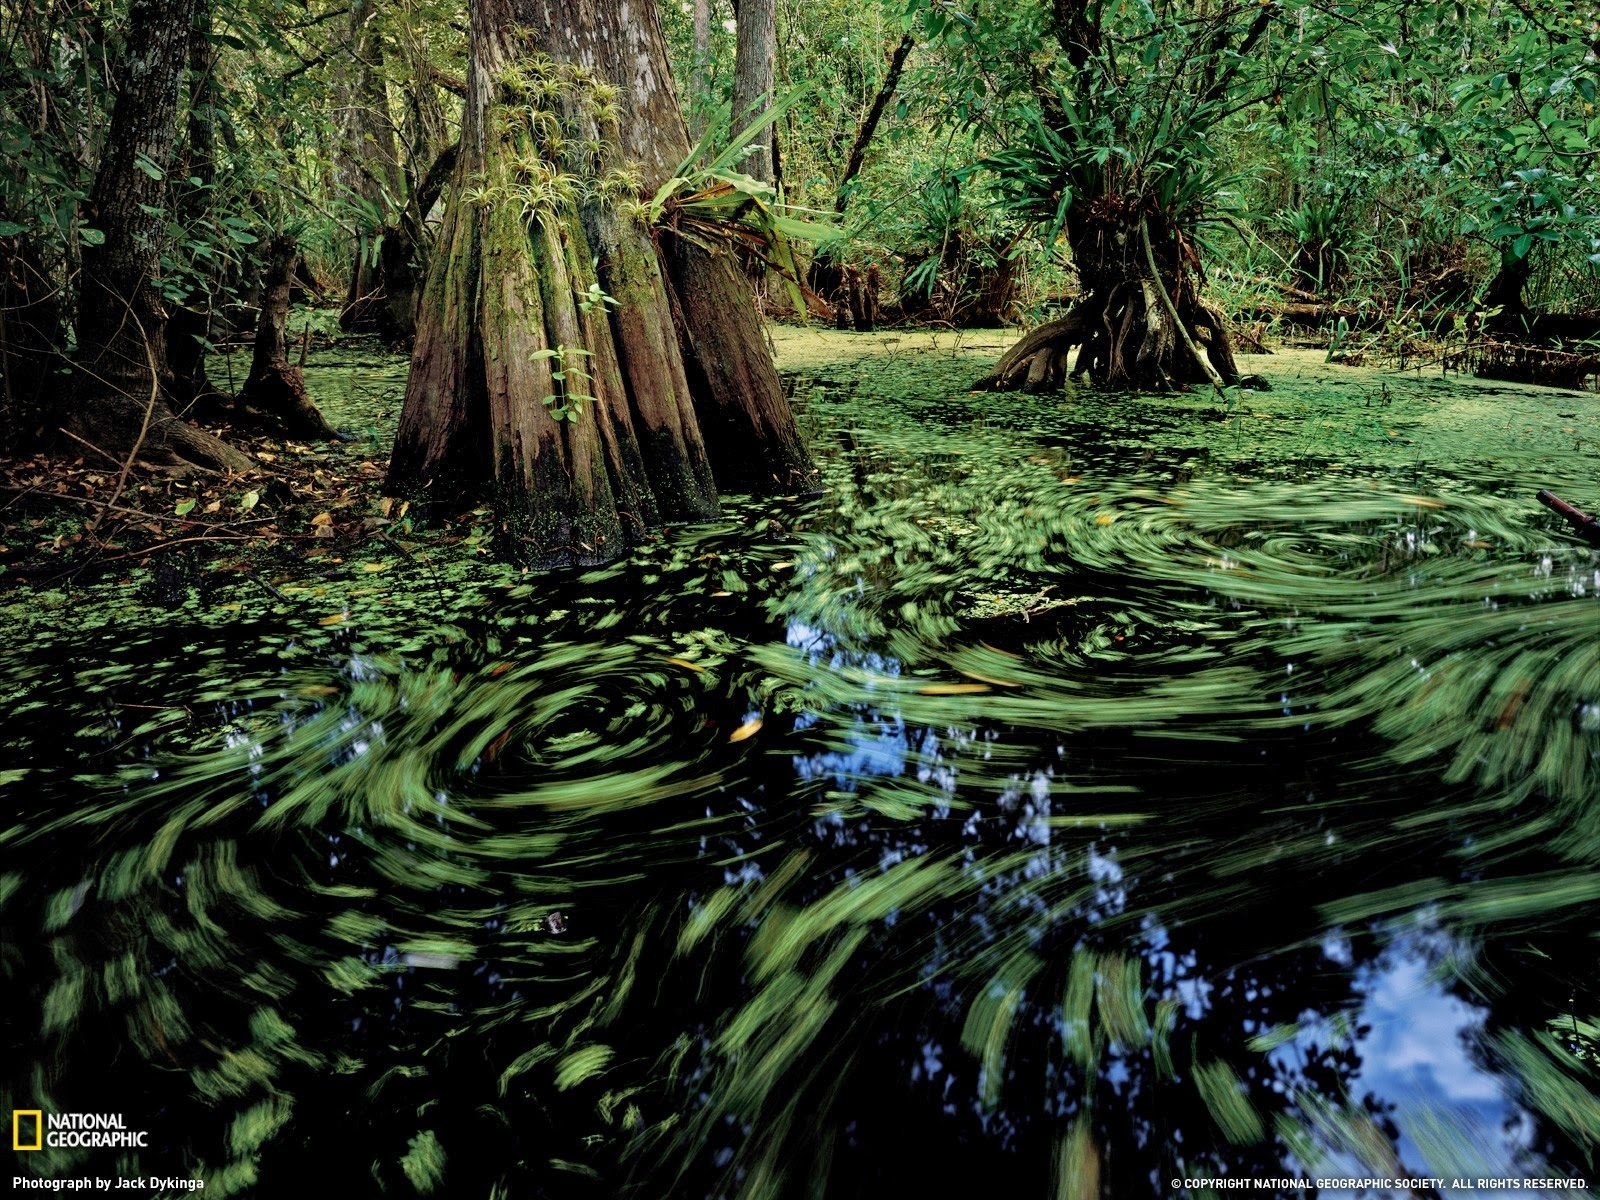 Wallpaper High Definition Hd Free Wallpaper Hd Beautiful Green Swamp